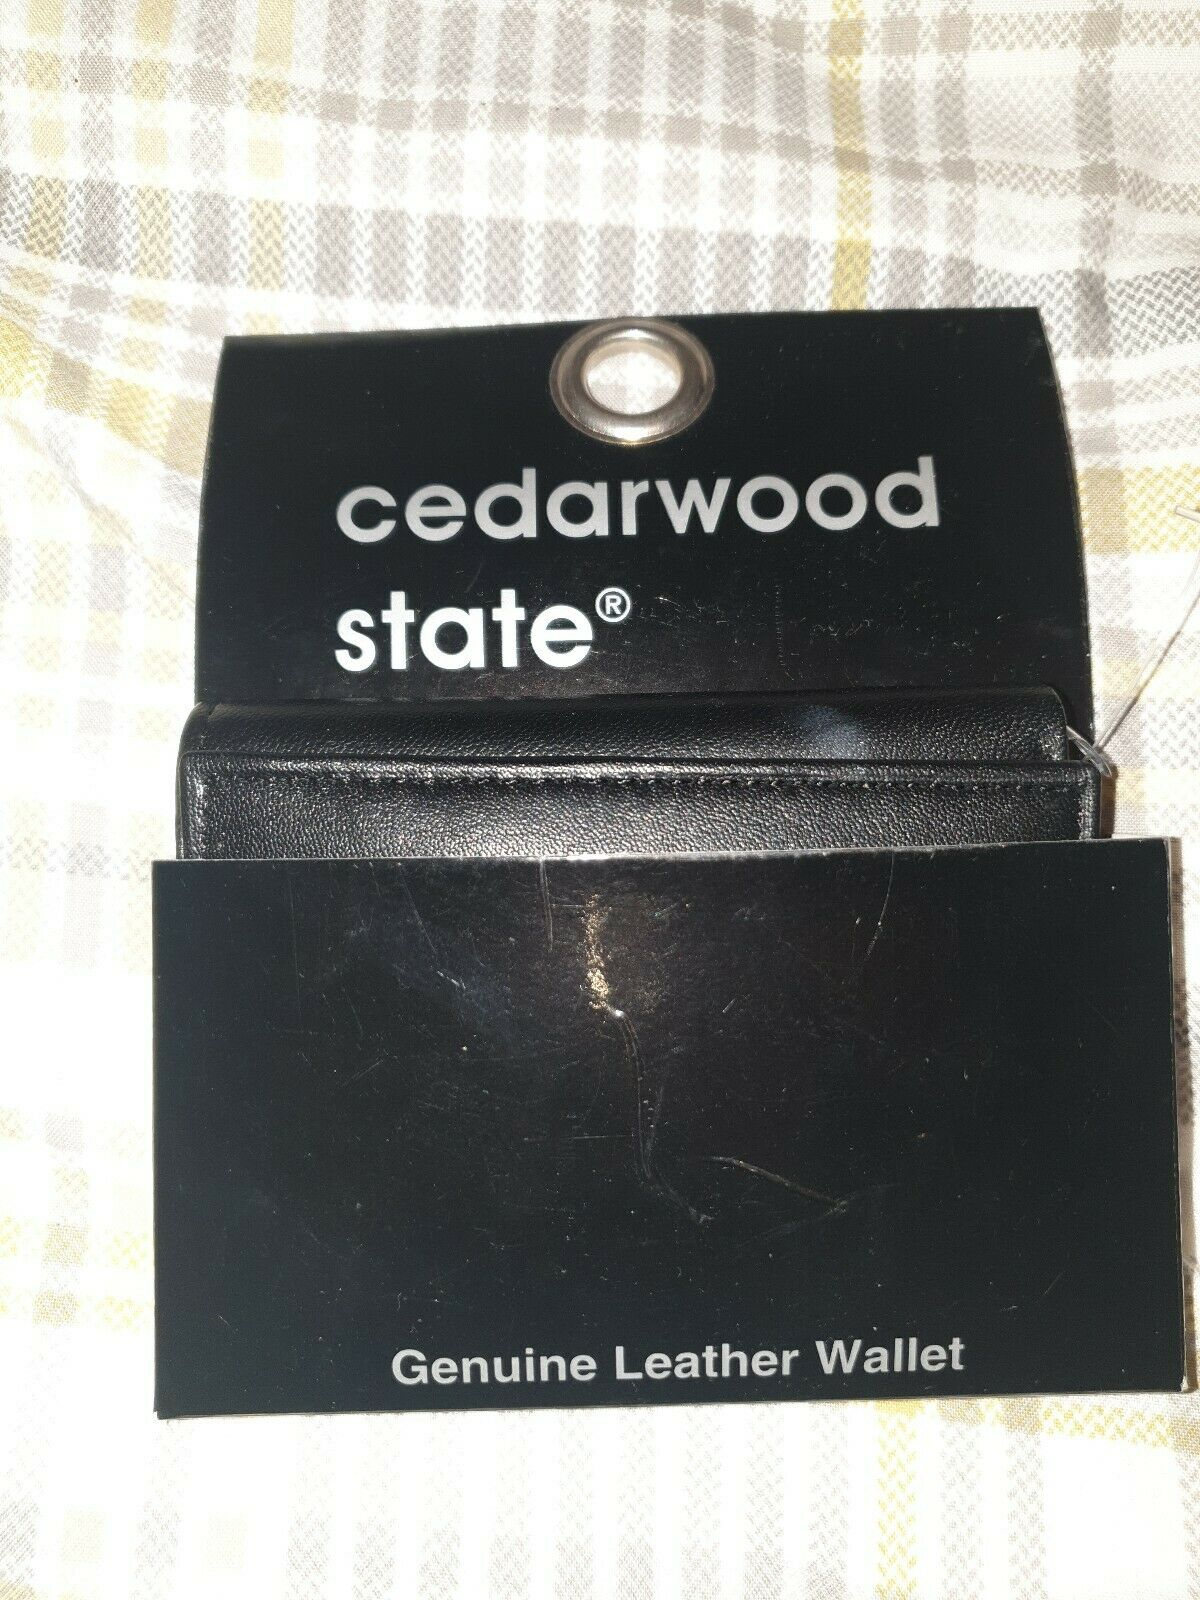 Cedarwood State Wallet